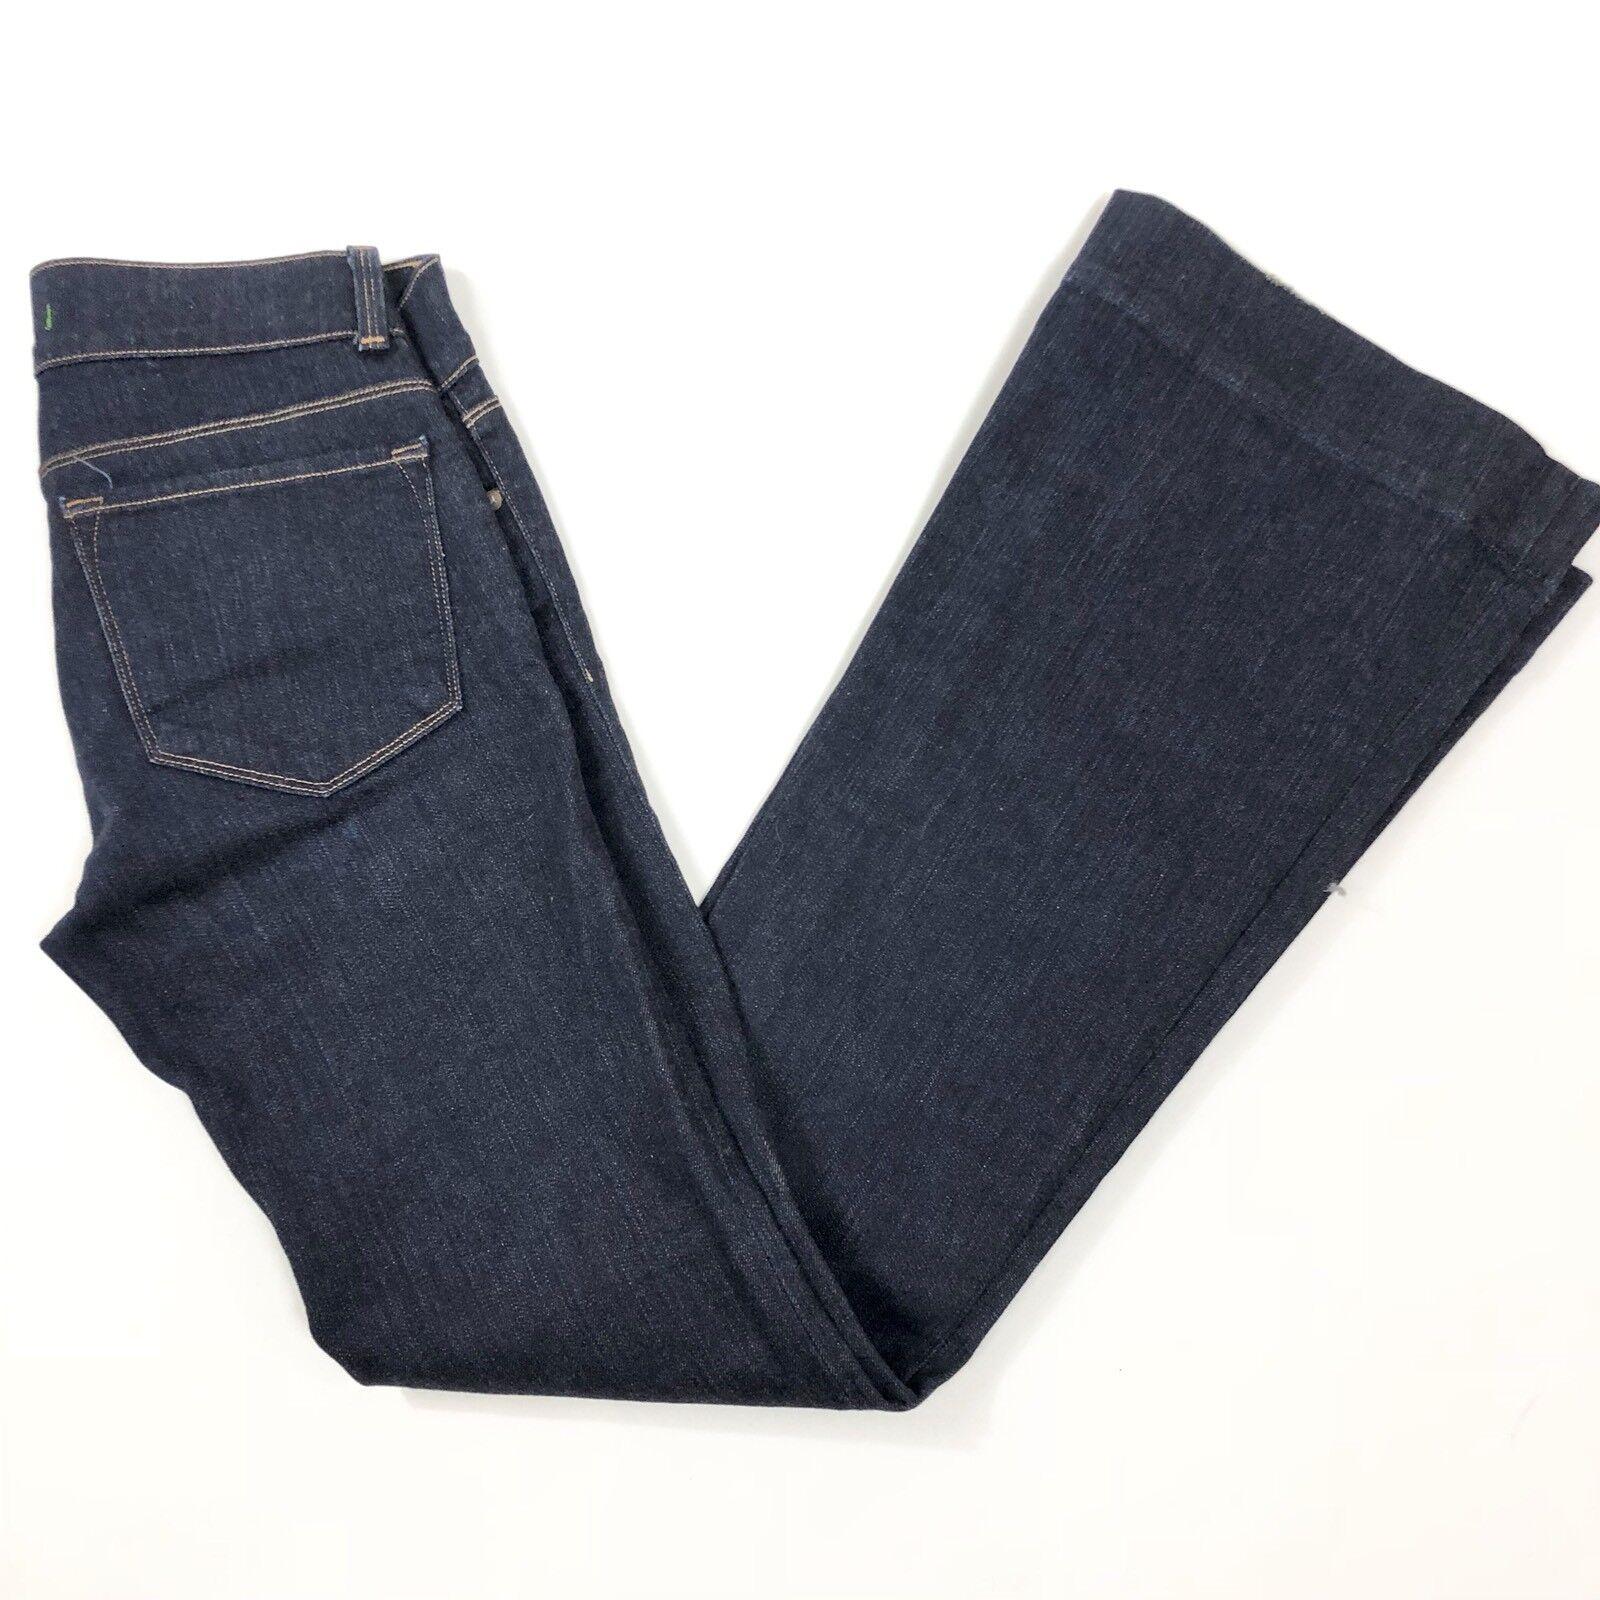 J Brand Womens 27x33 Flare Jeans 72201 Ink Dark Wash